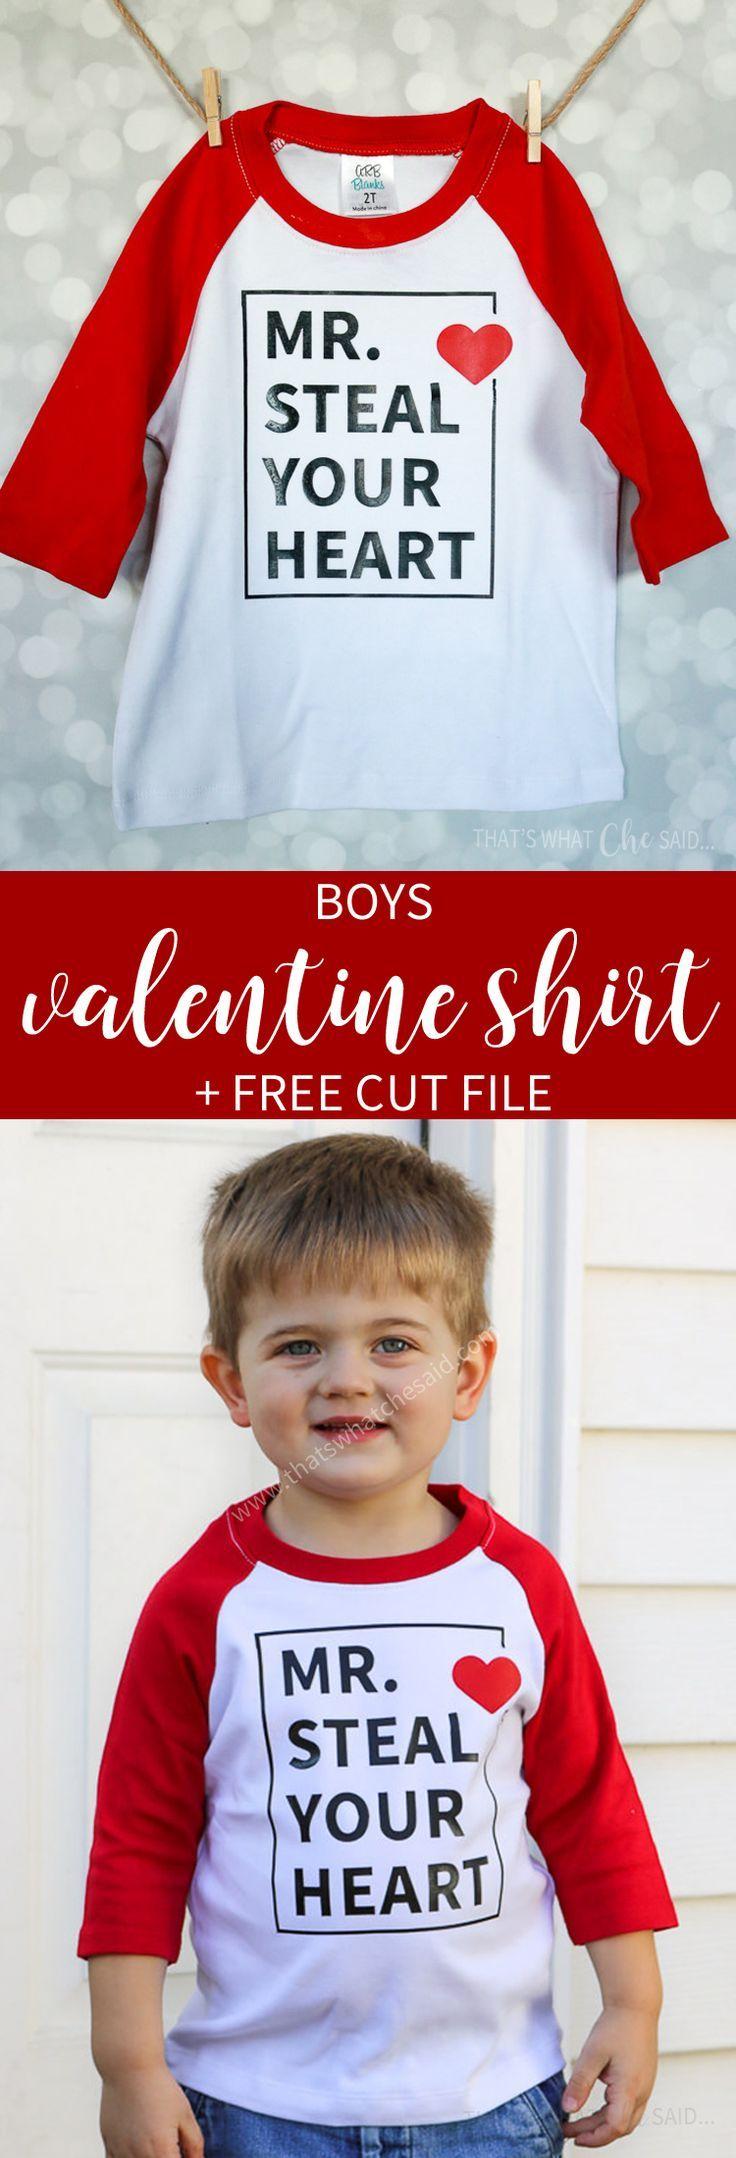 Boys Valentine Shirt Design Free Cut File A Fun And Cute